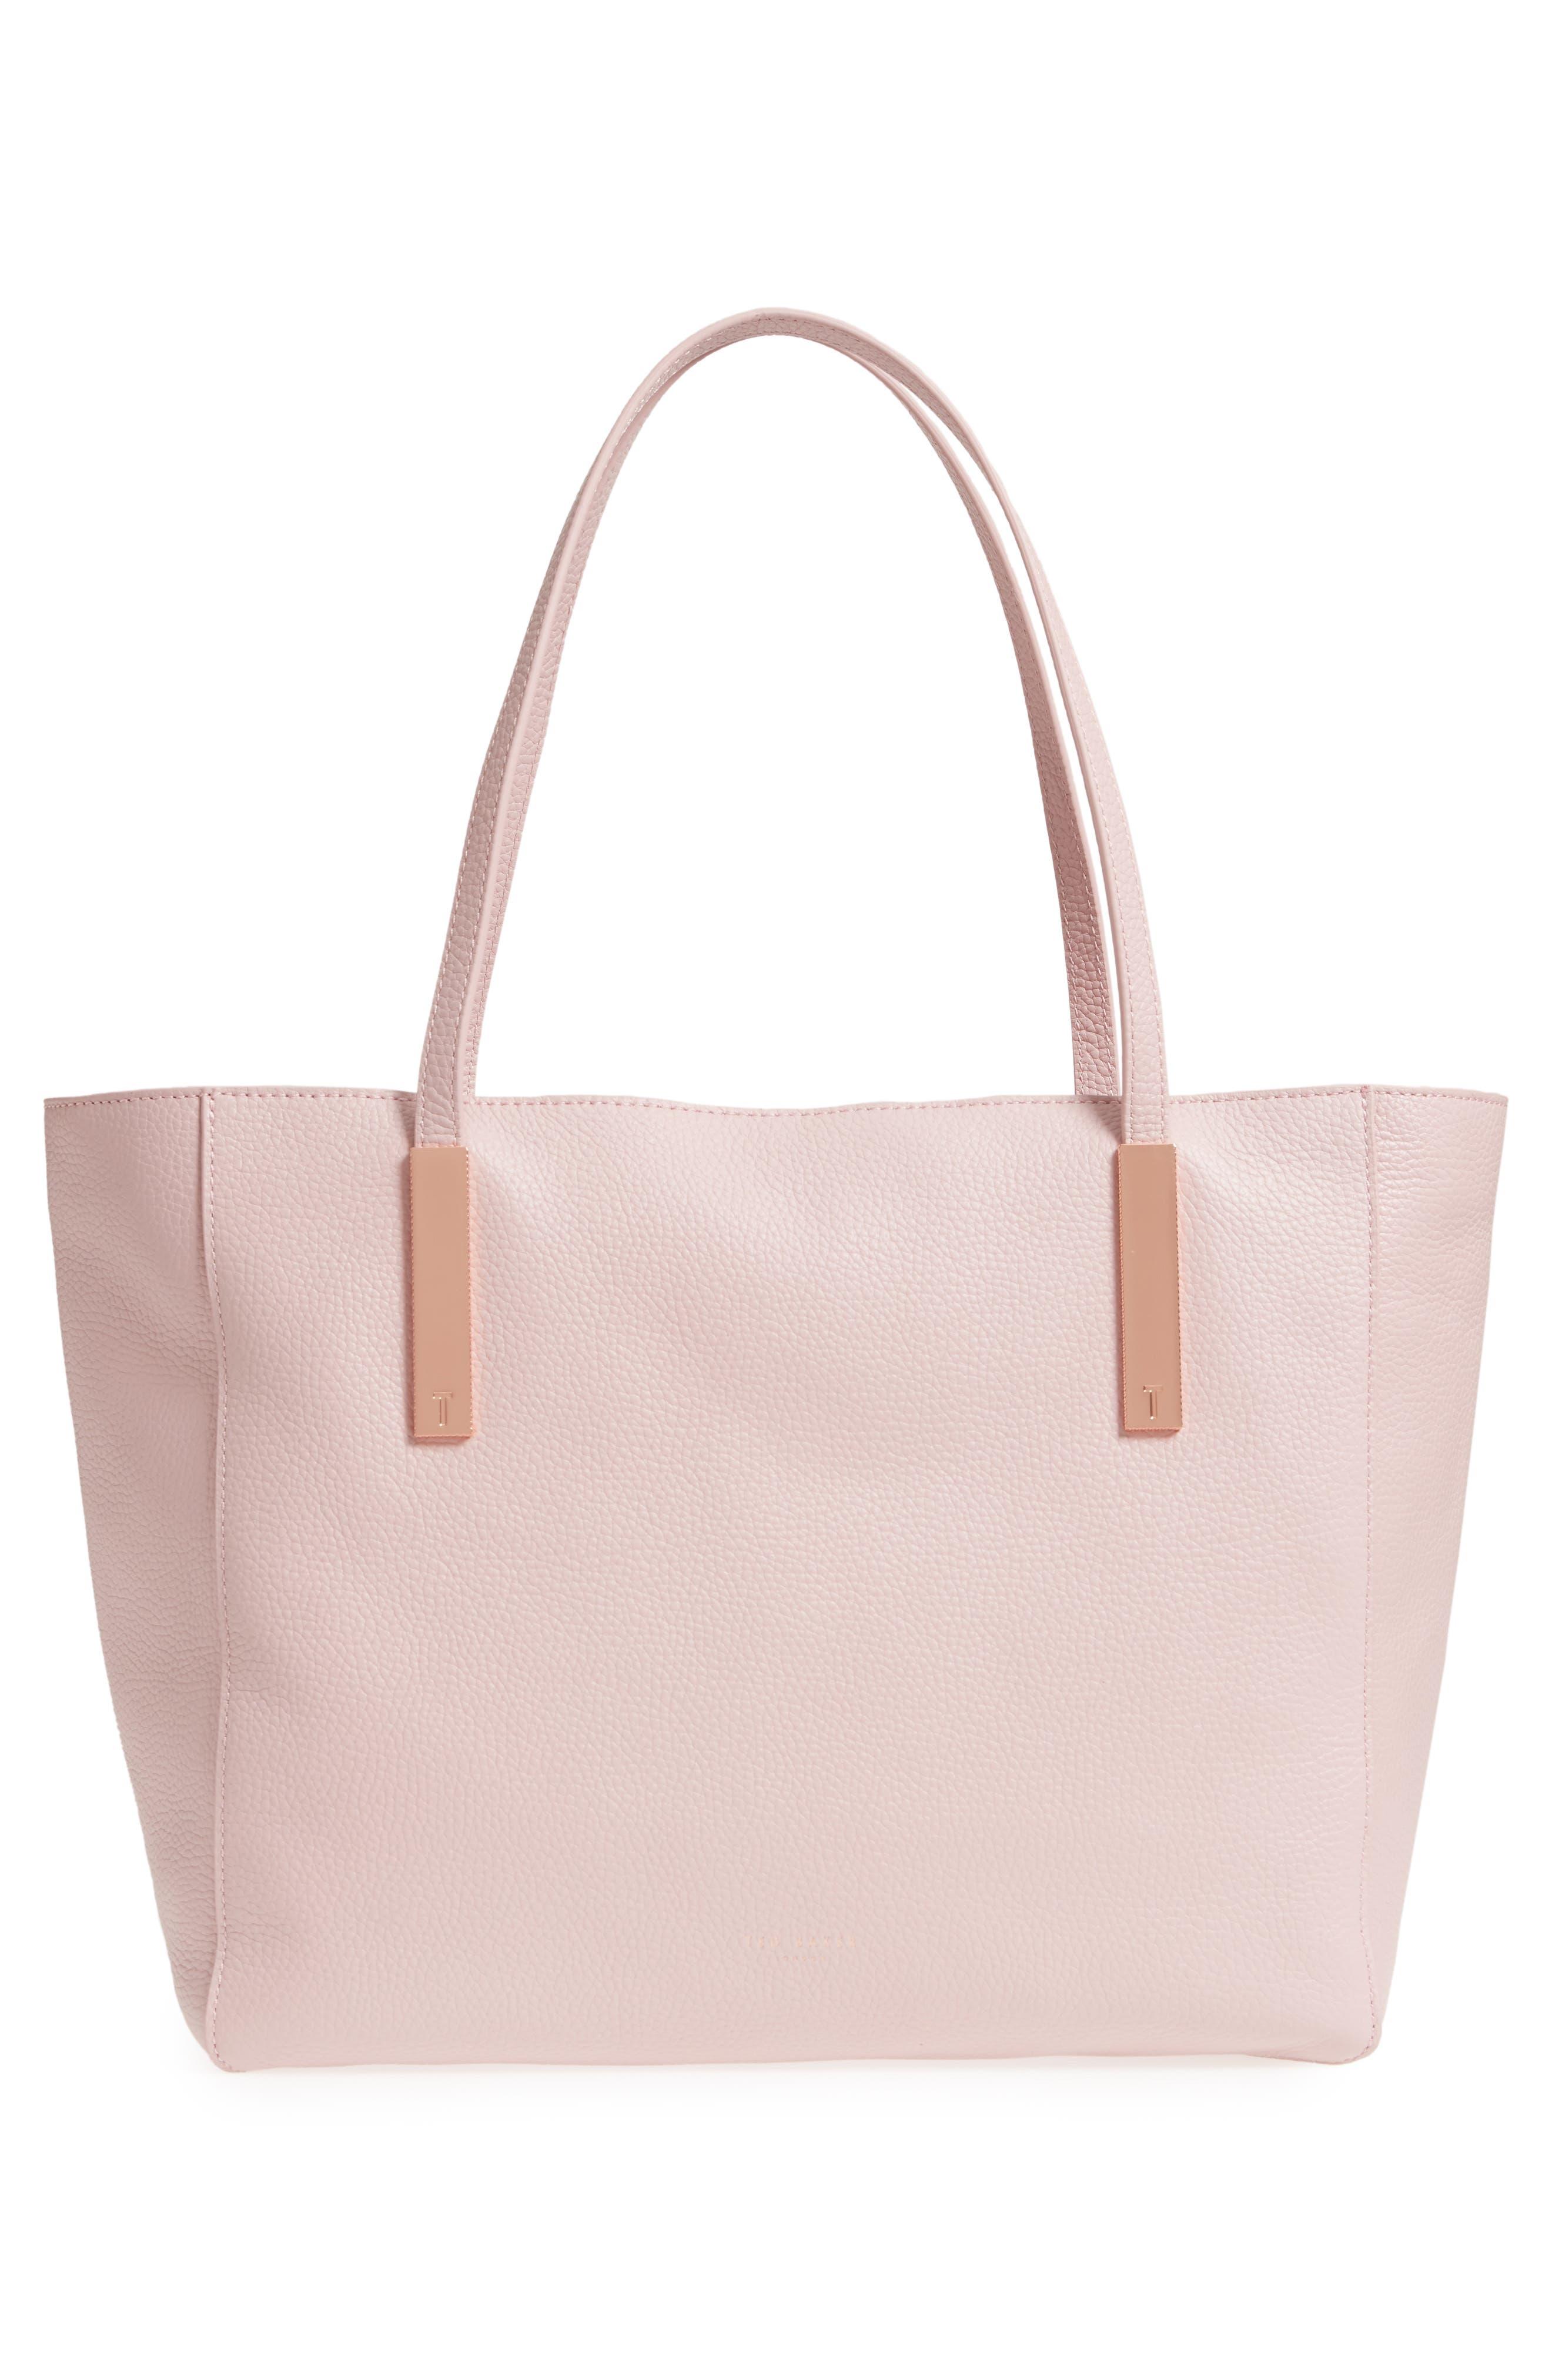 Soft Blossom Leather Shopper,                             Alternate thumbnail 3, color,